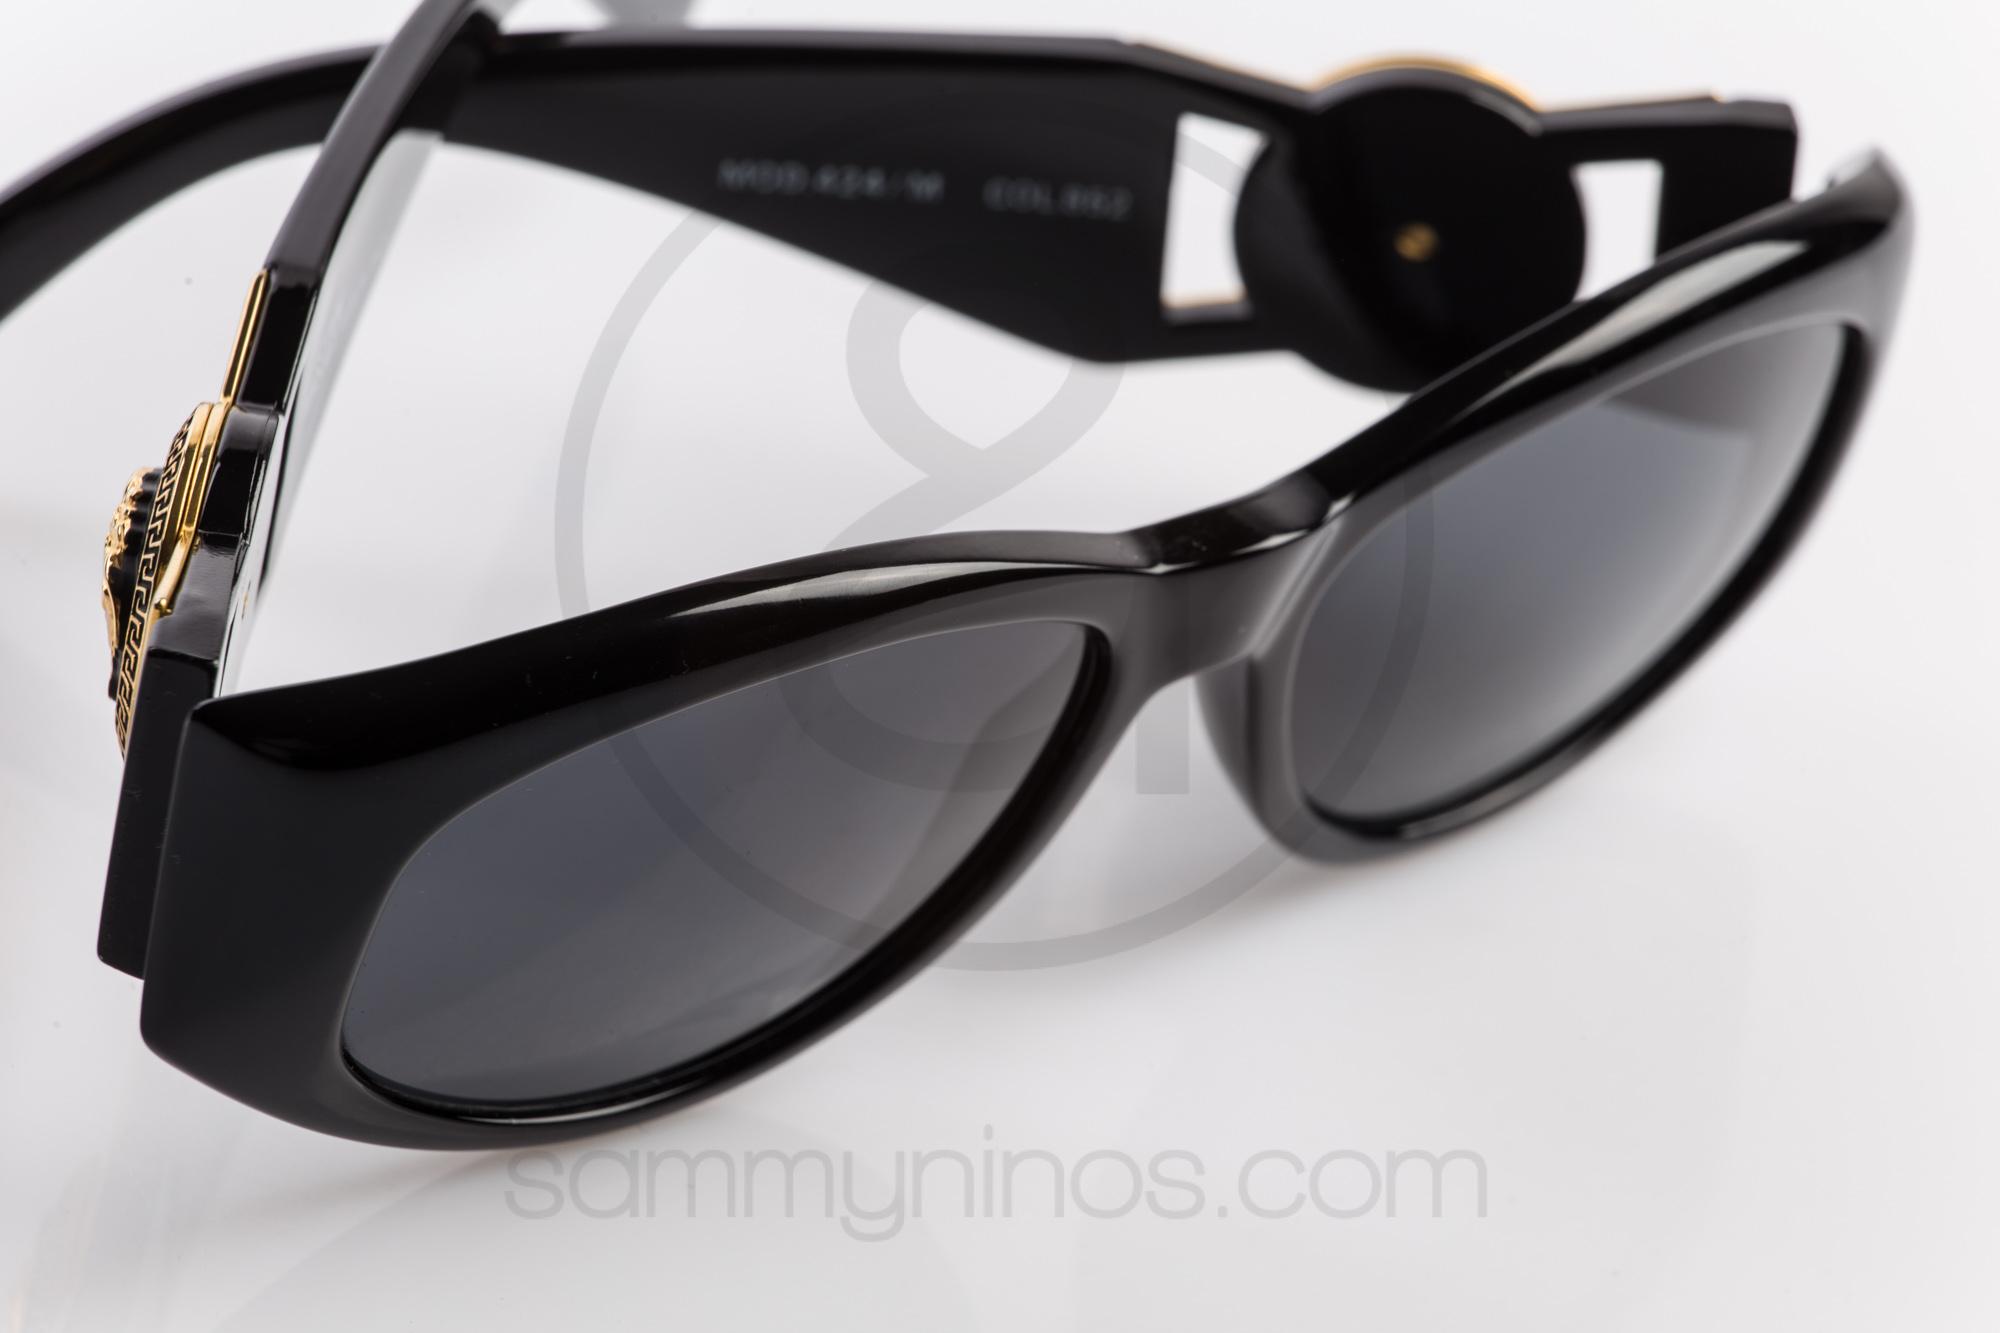 f79915acf6d2 Gold Gianni Versace Sunglasses - Bitterroot Public Library